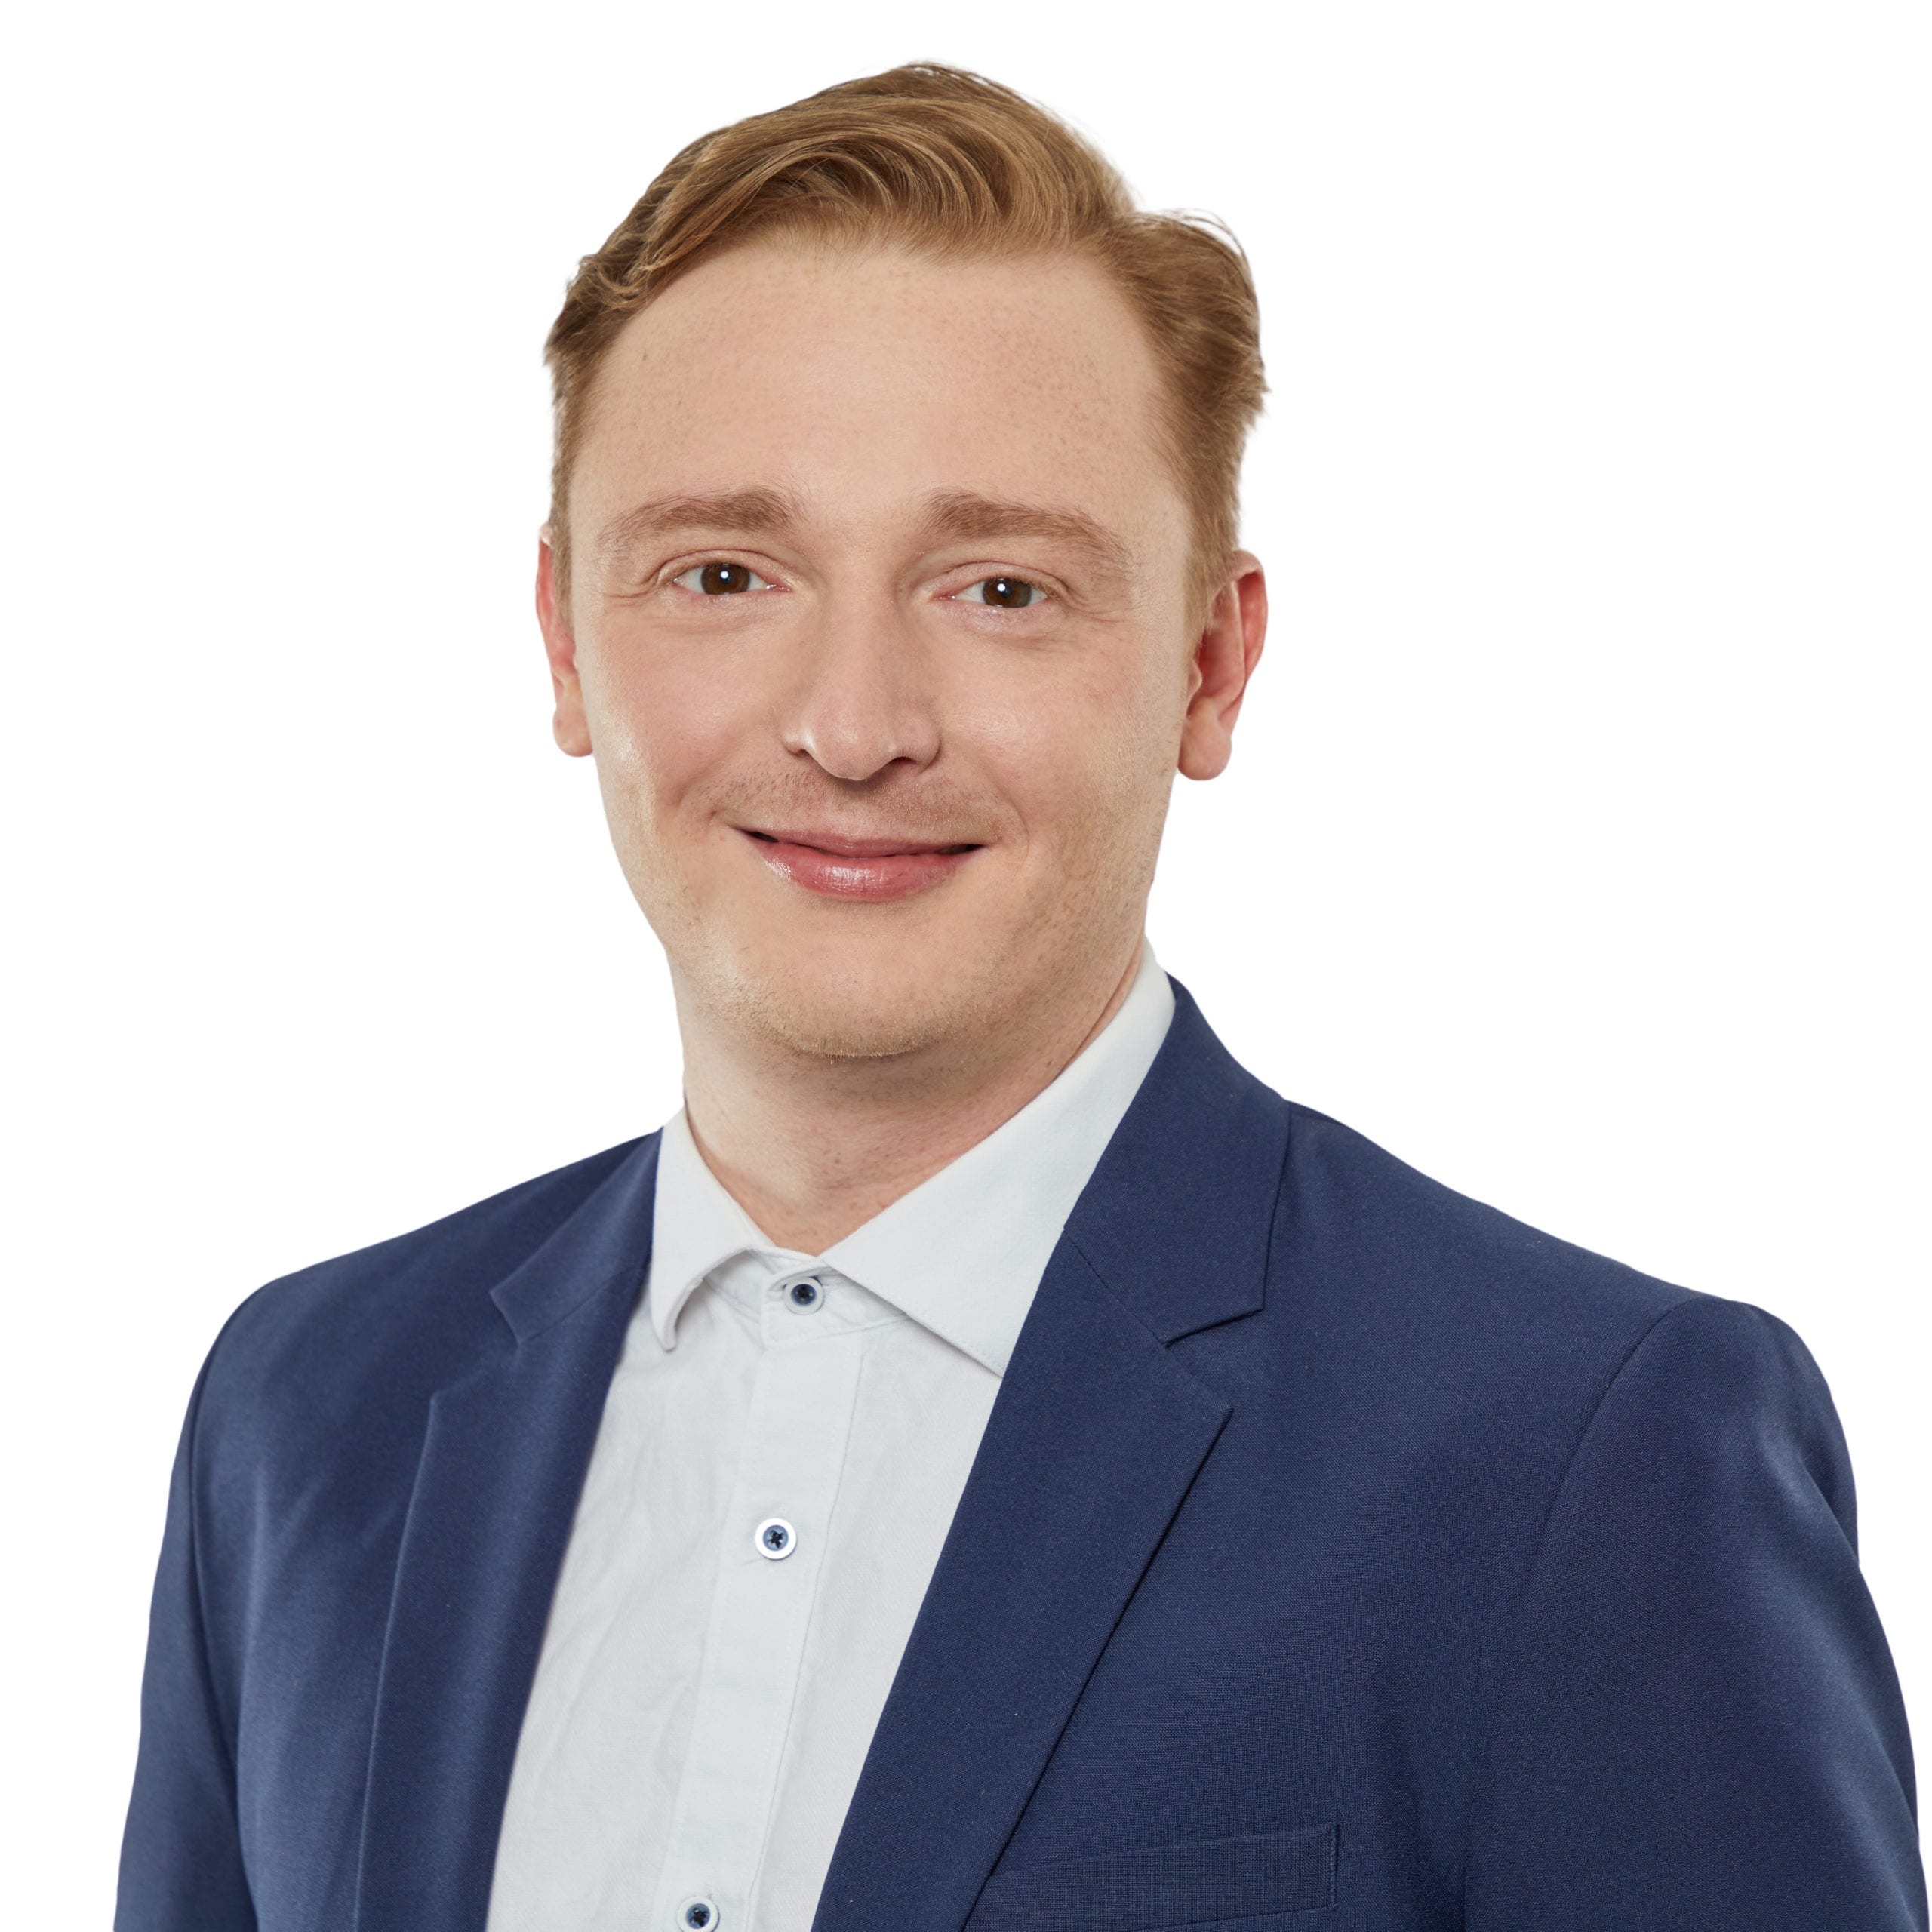 Andreas Bender